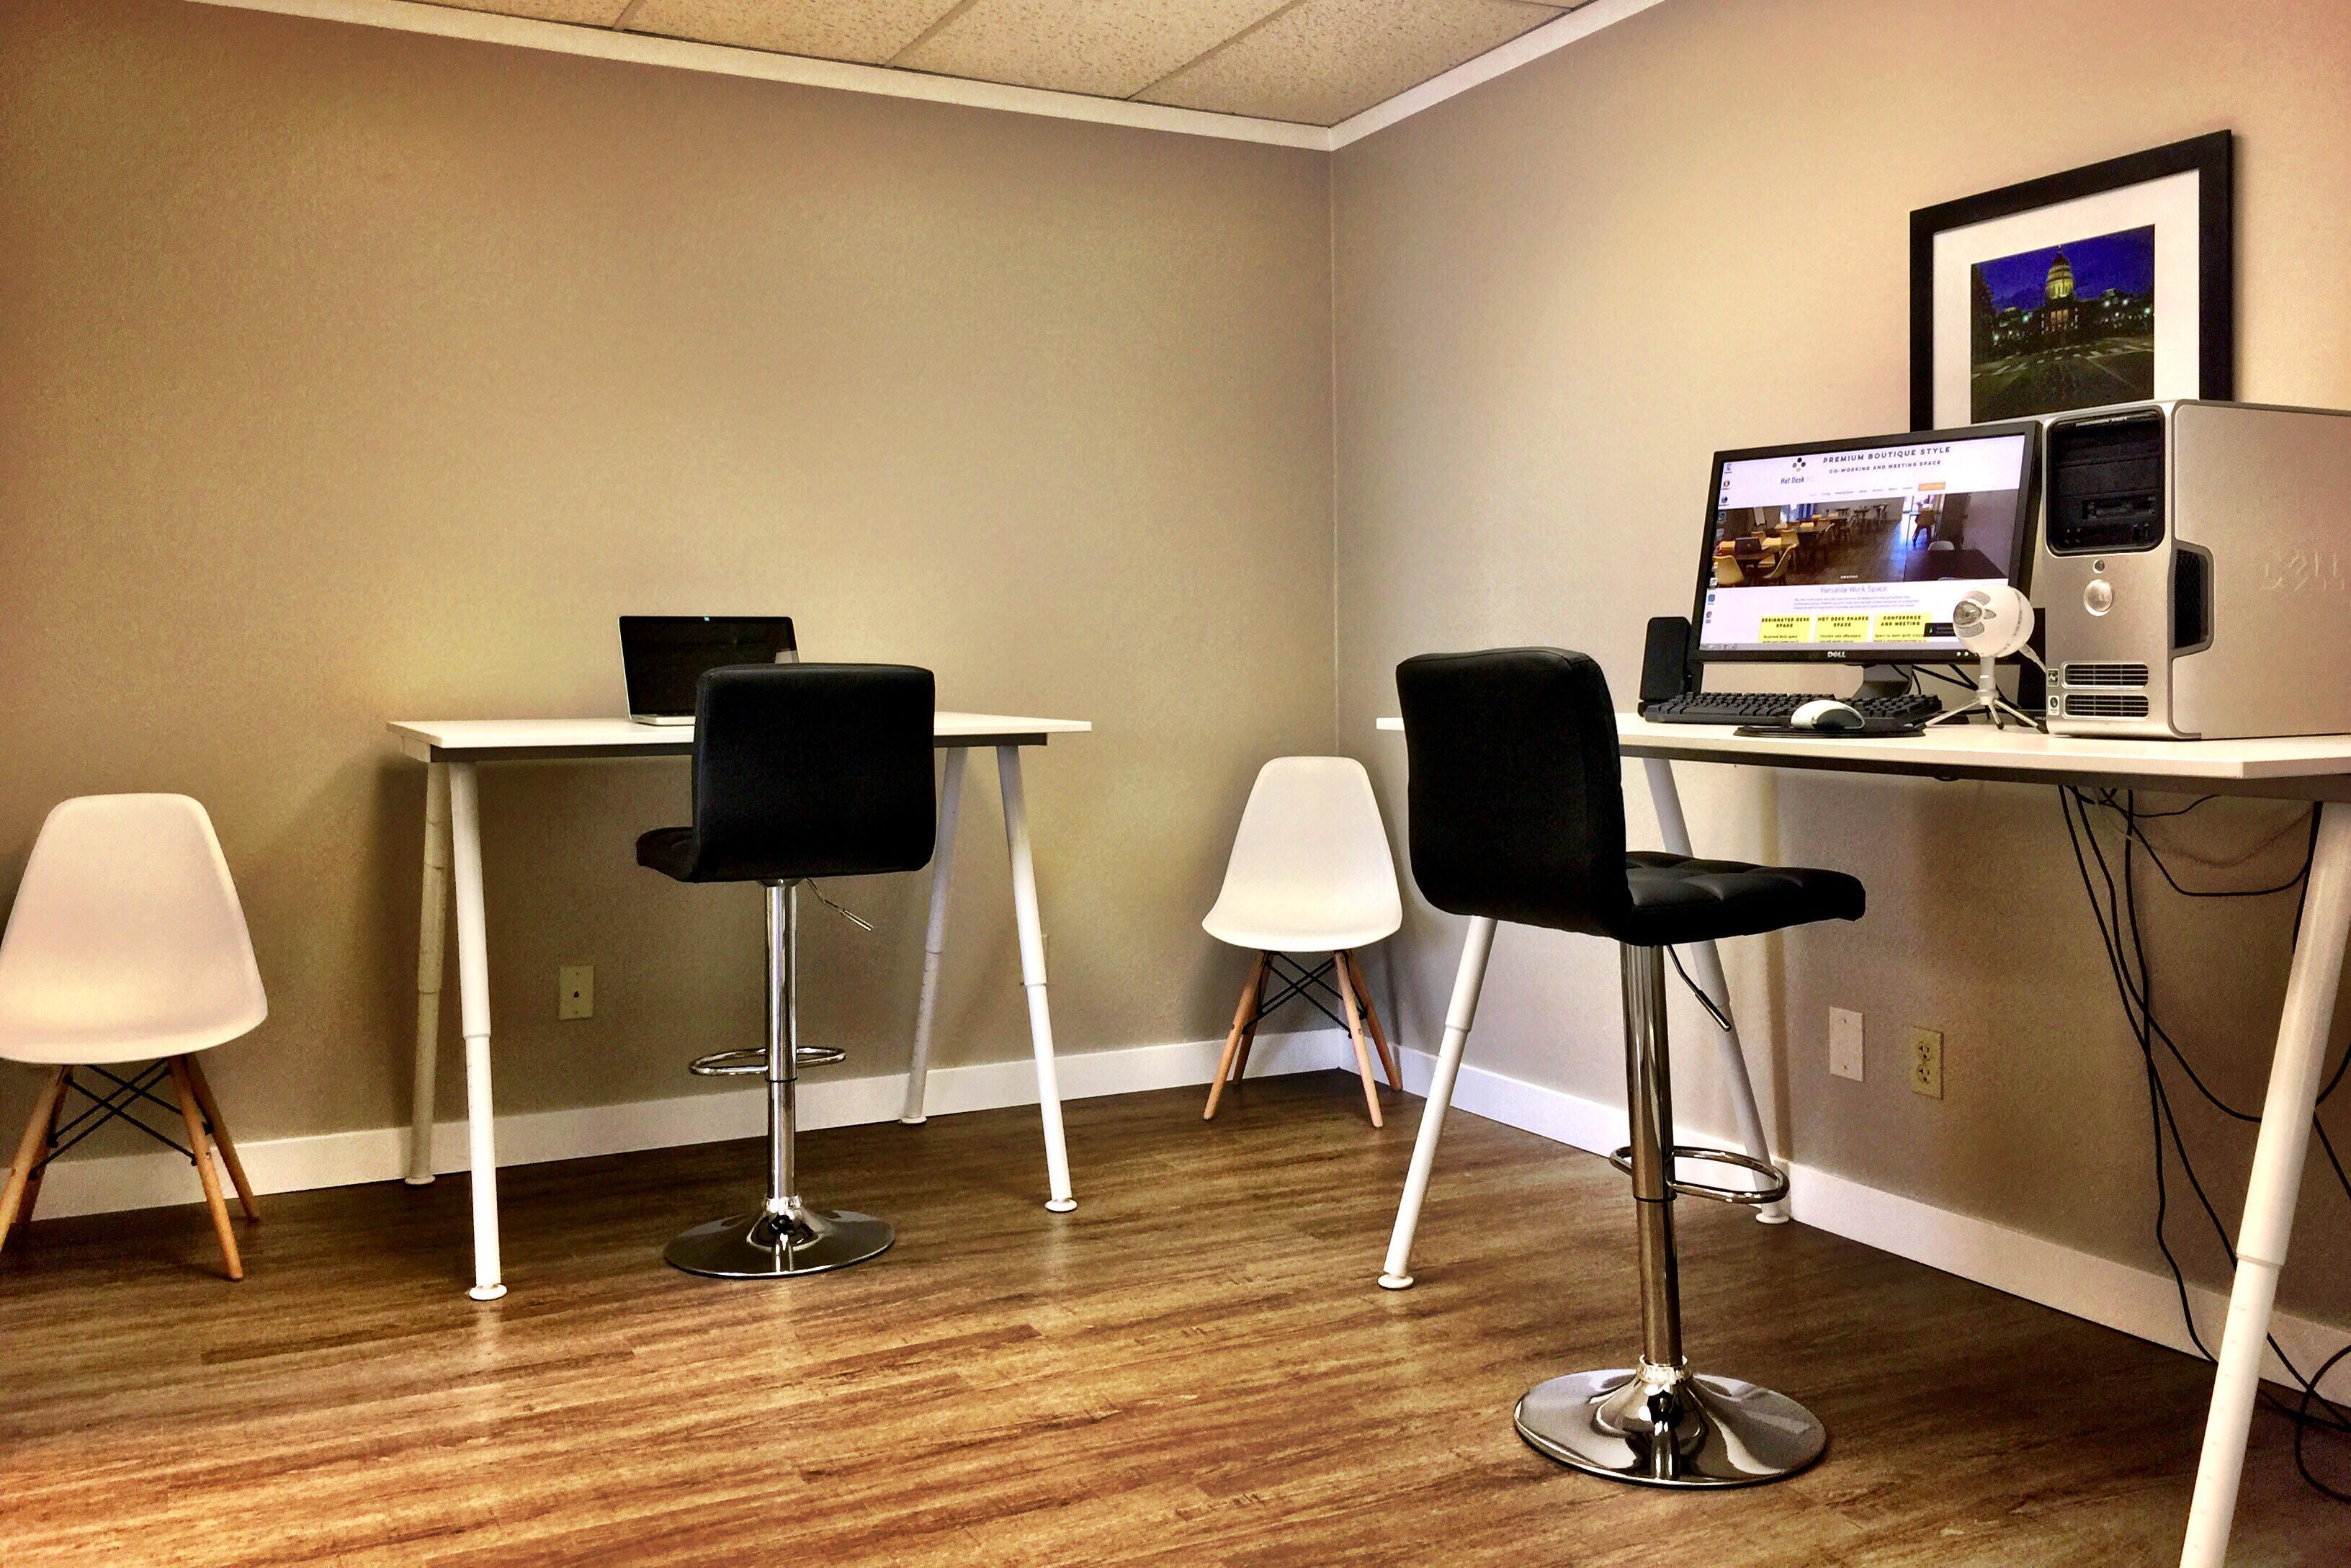 Hot Desk HQ - Dedicated Office